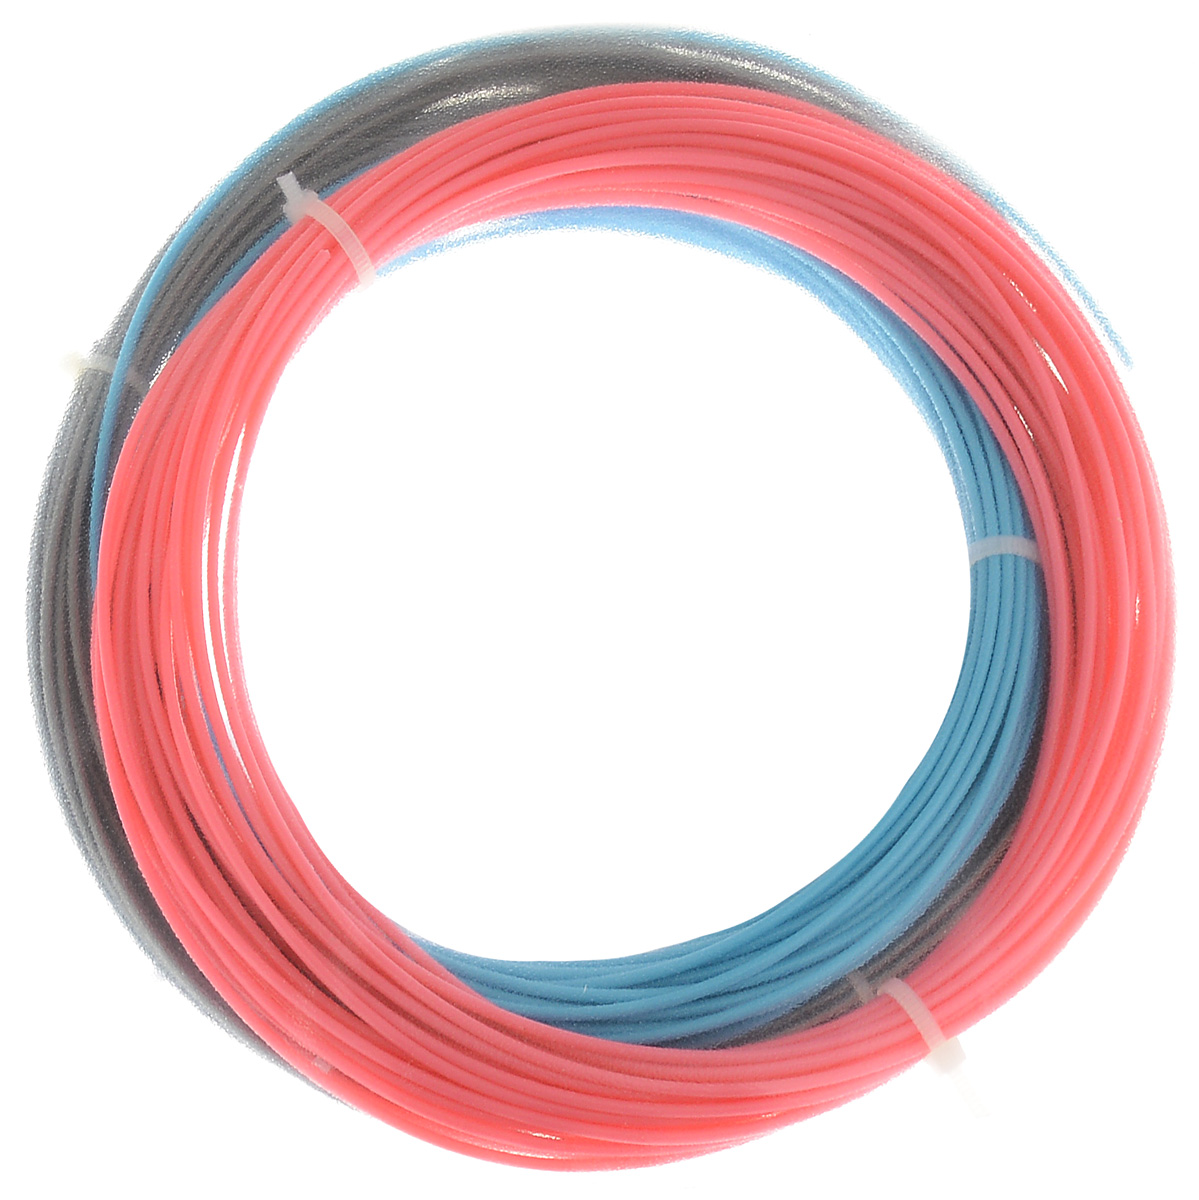 ESUN 3D Filament, Blue Pink Silver комплект ABS-пластика (10 м) open heacent reprap prusa mendel 3dp01 3d printer assembly kit 0 4mm nozzle 3mm filament